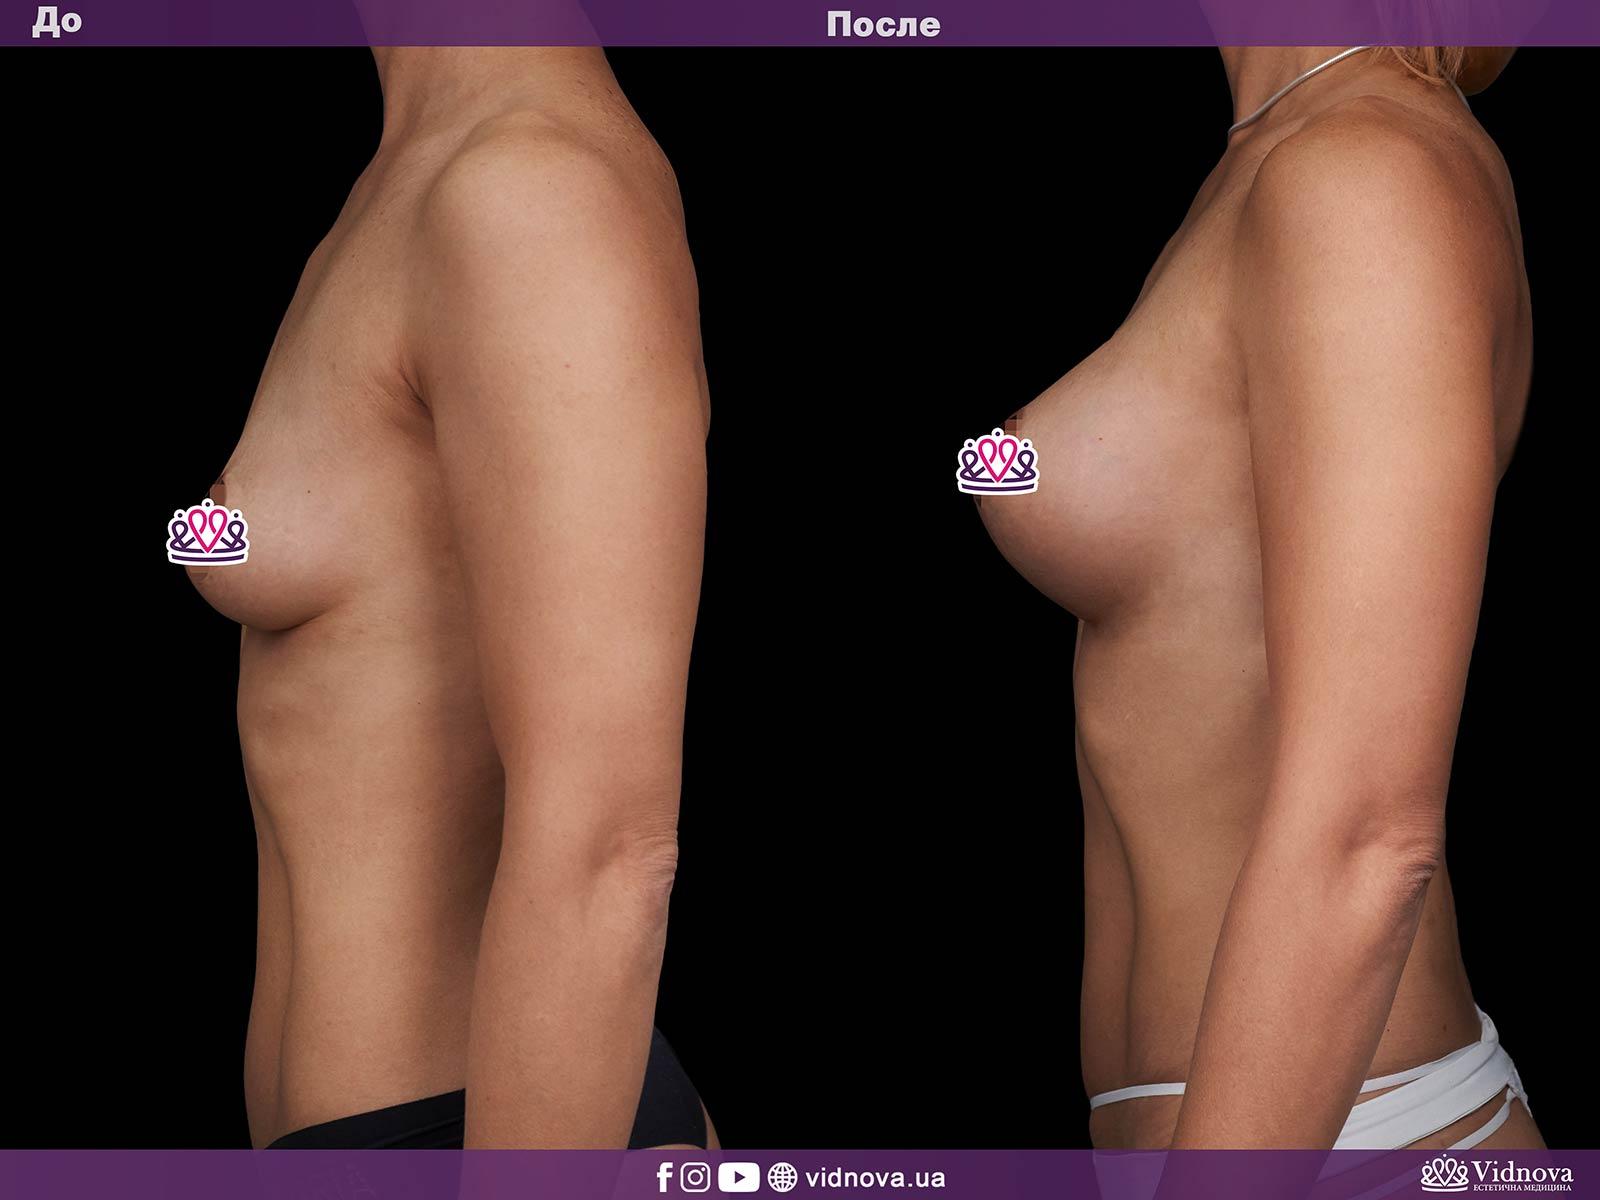 Увеличение груди: Фото ДО и ПОСЛЕ - Пример №10-3 - Клиника Vidnova